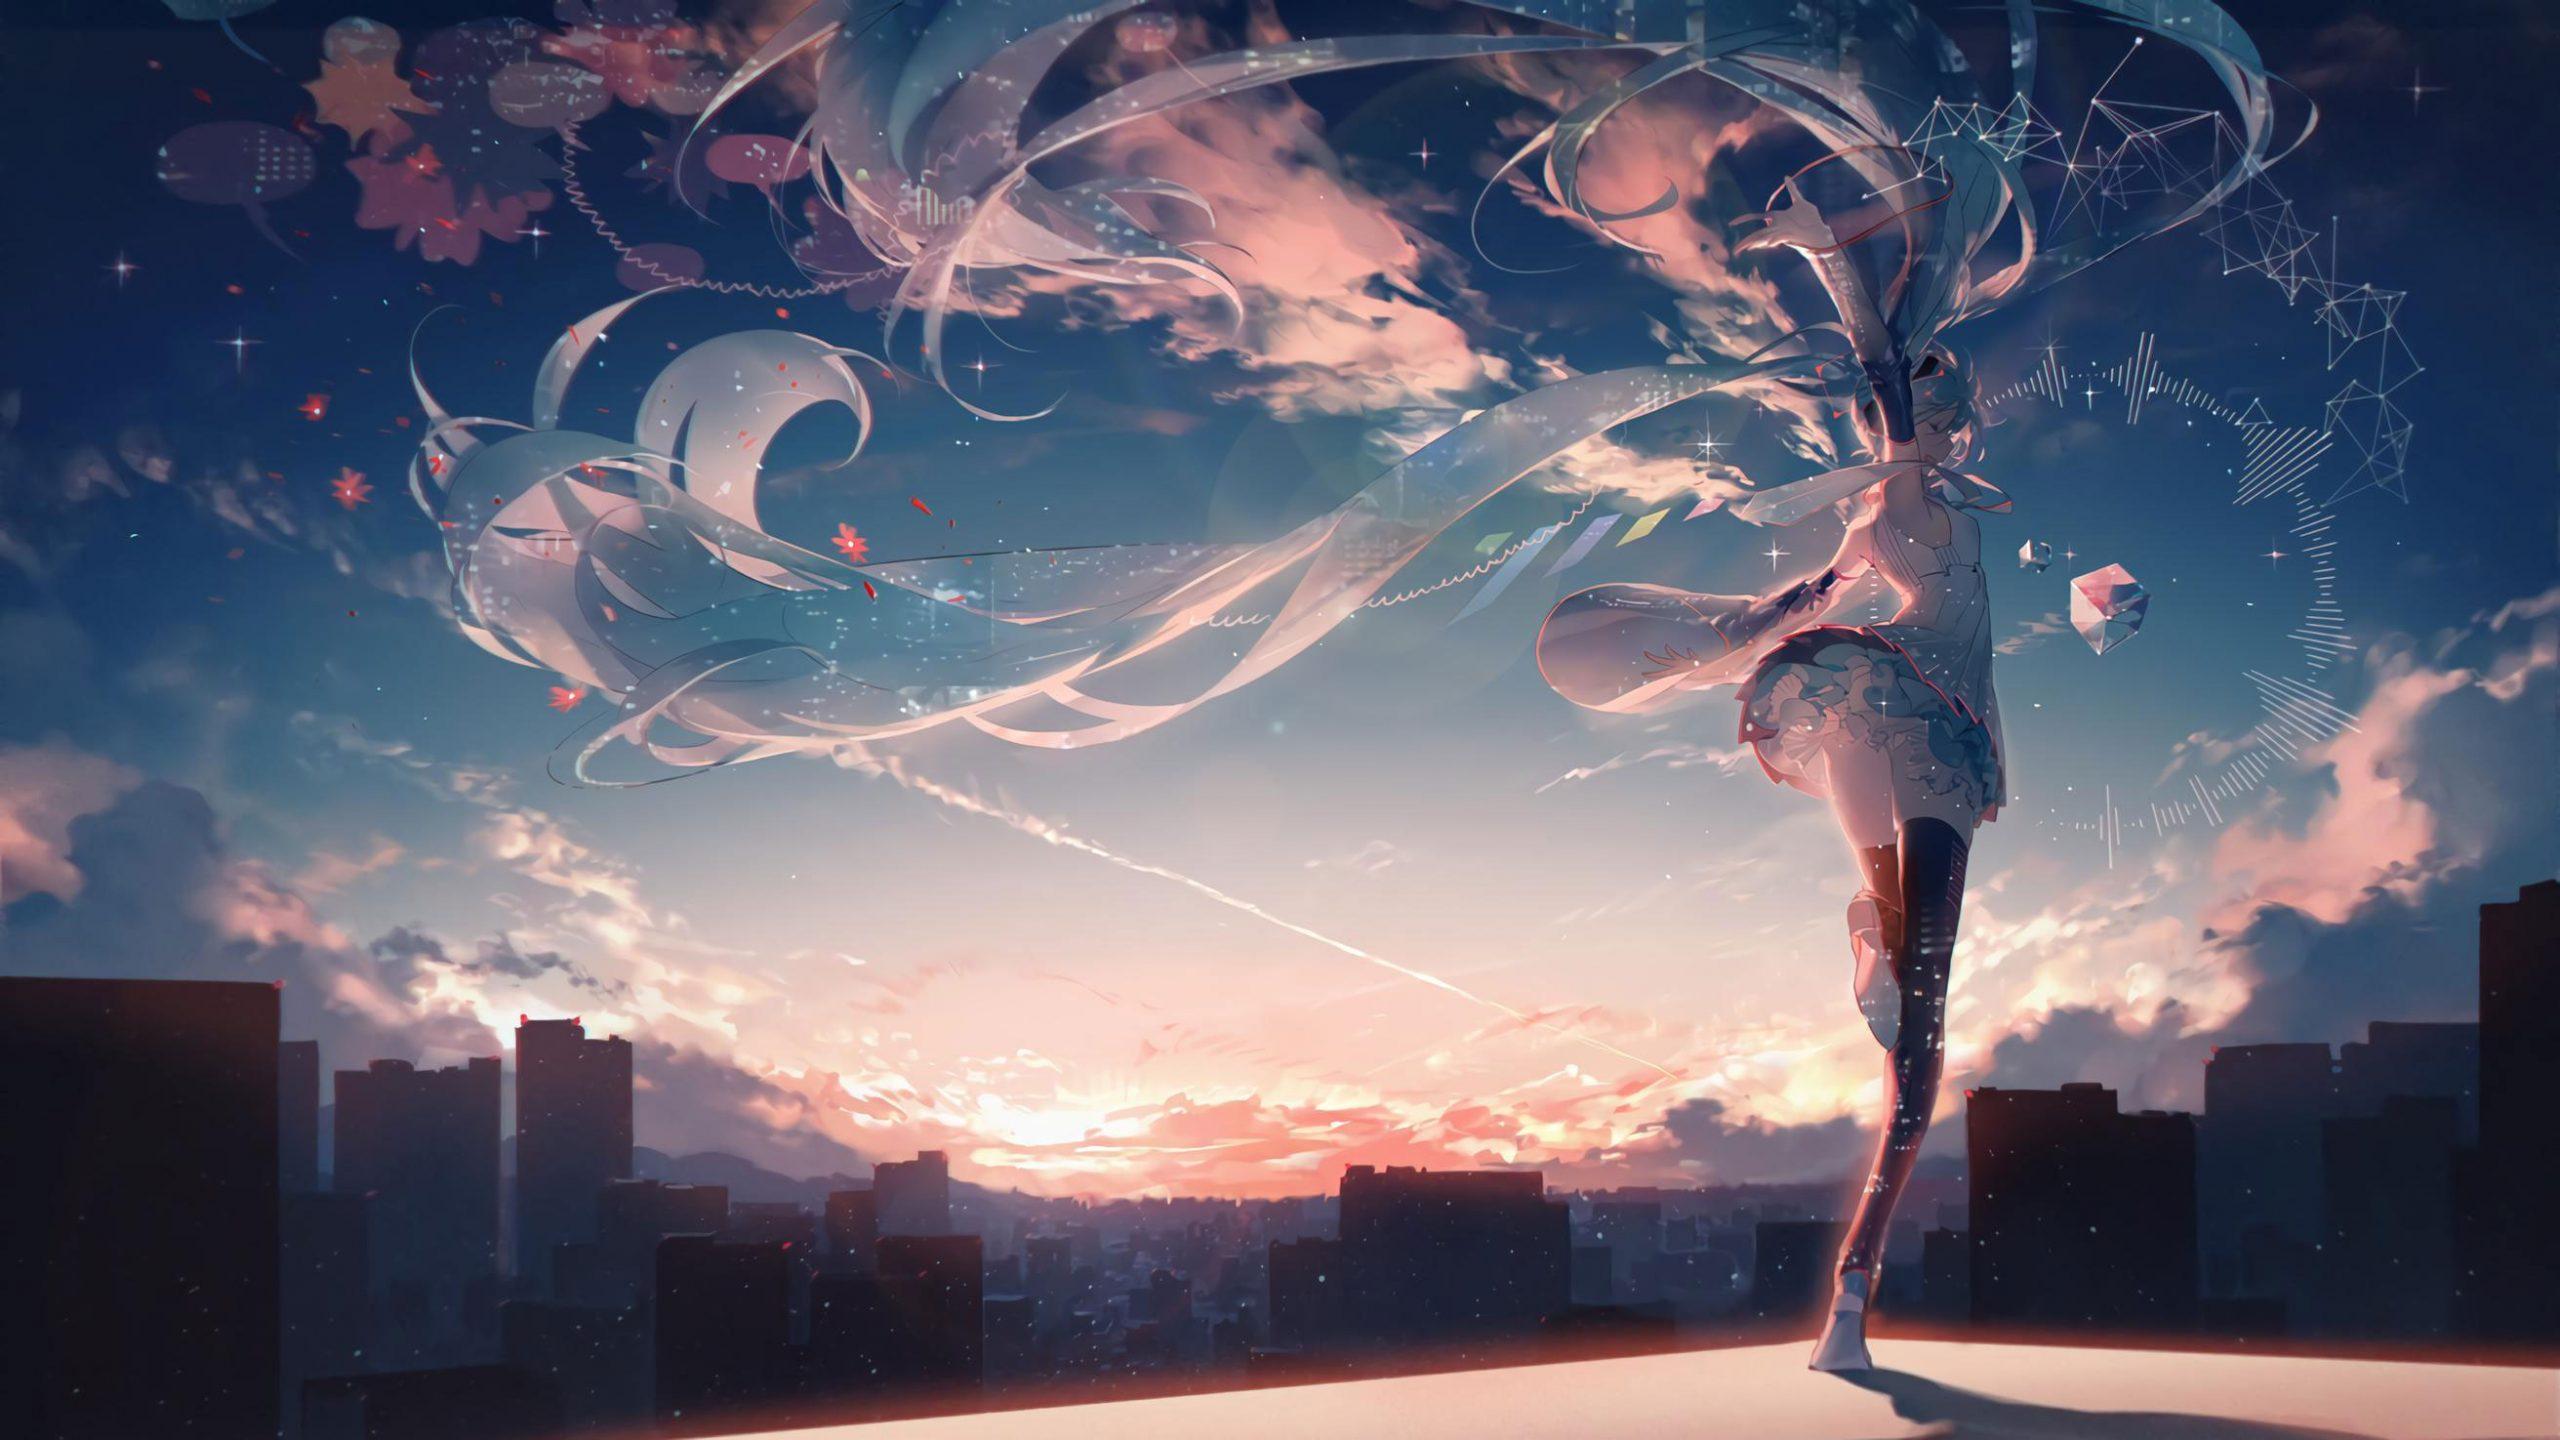 Lofi Anime Iphone Wallpaper Wallpaper For You Hd Wallpaper For Desktop Mobile